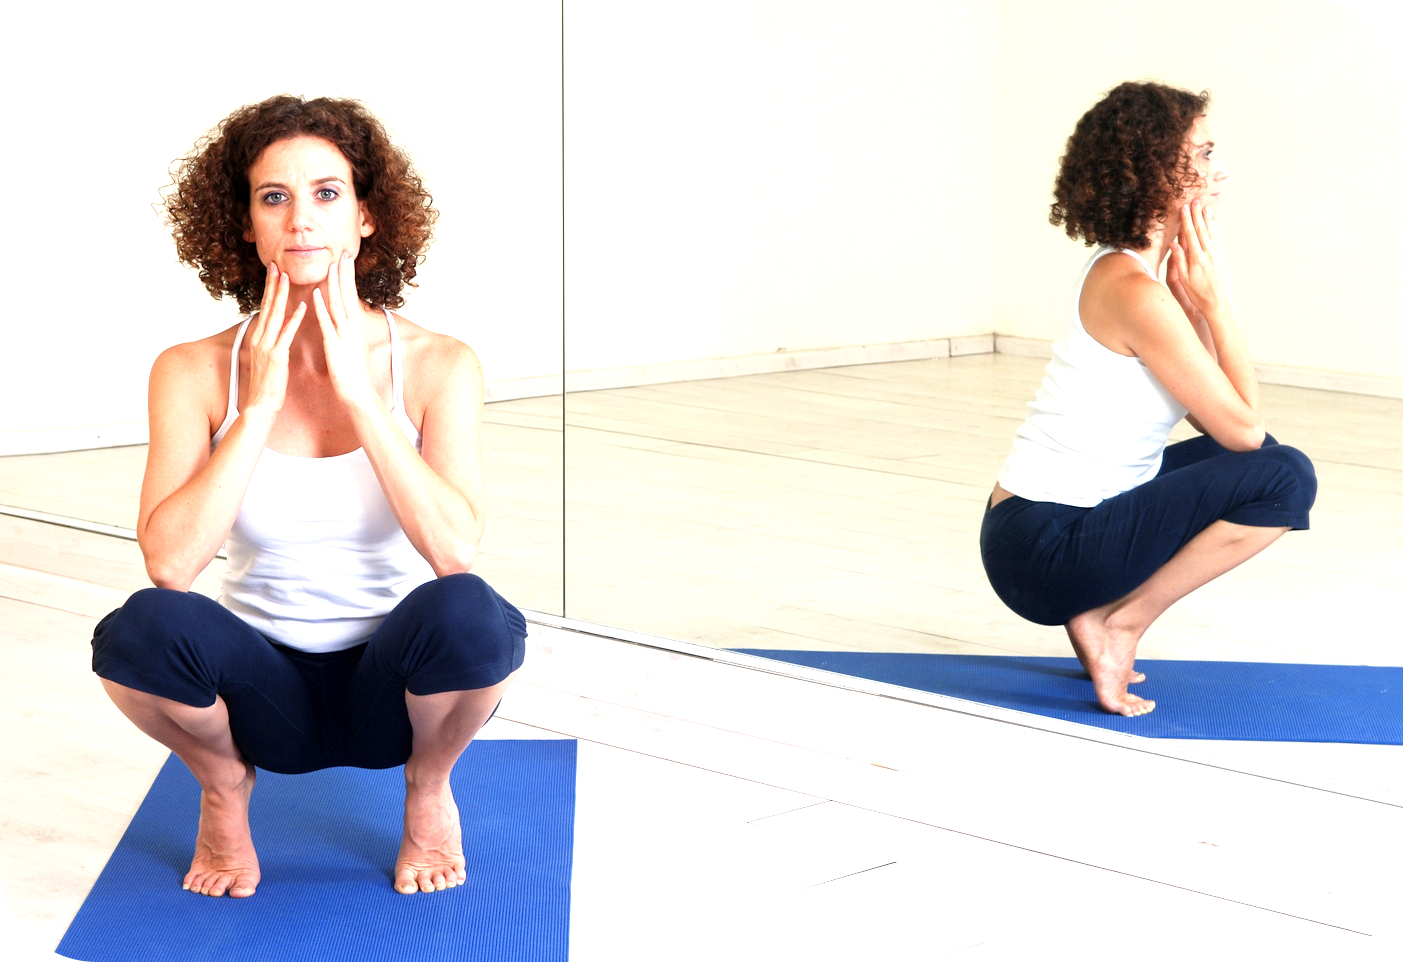 http://unrespiro.es/detaille-curso/Valvanera-Berenguer/clases-hatha-yoga-online-en-casa